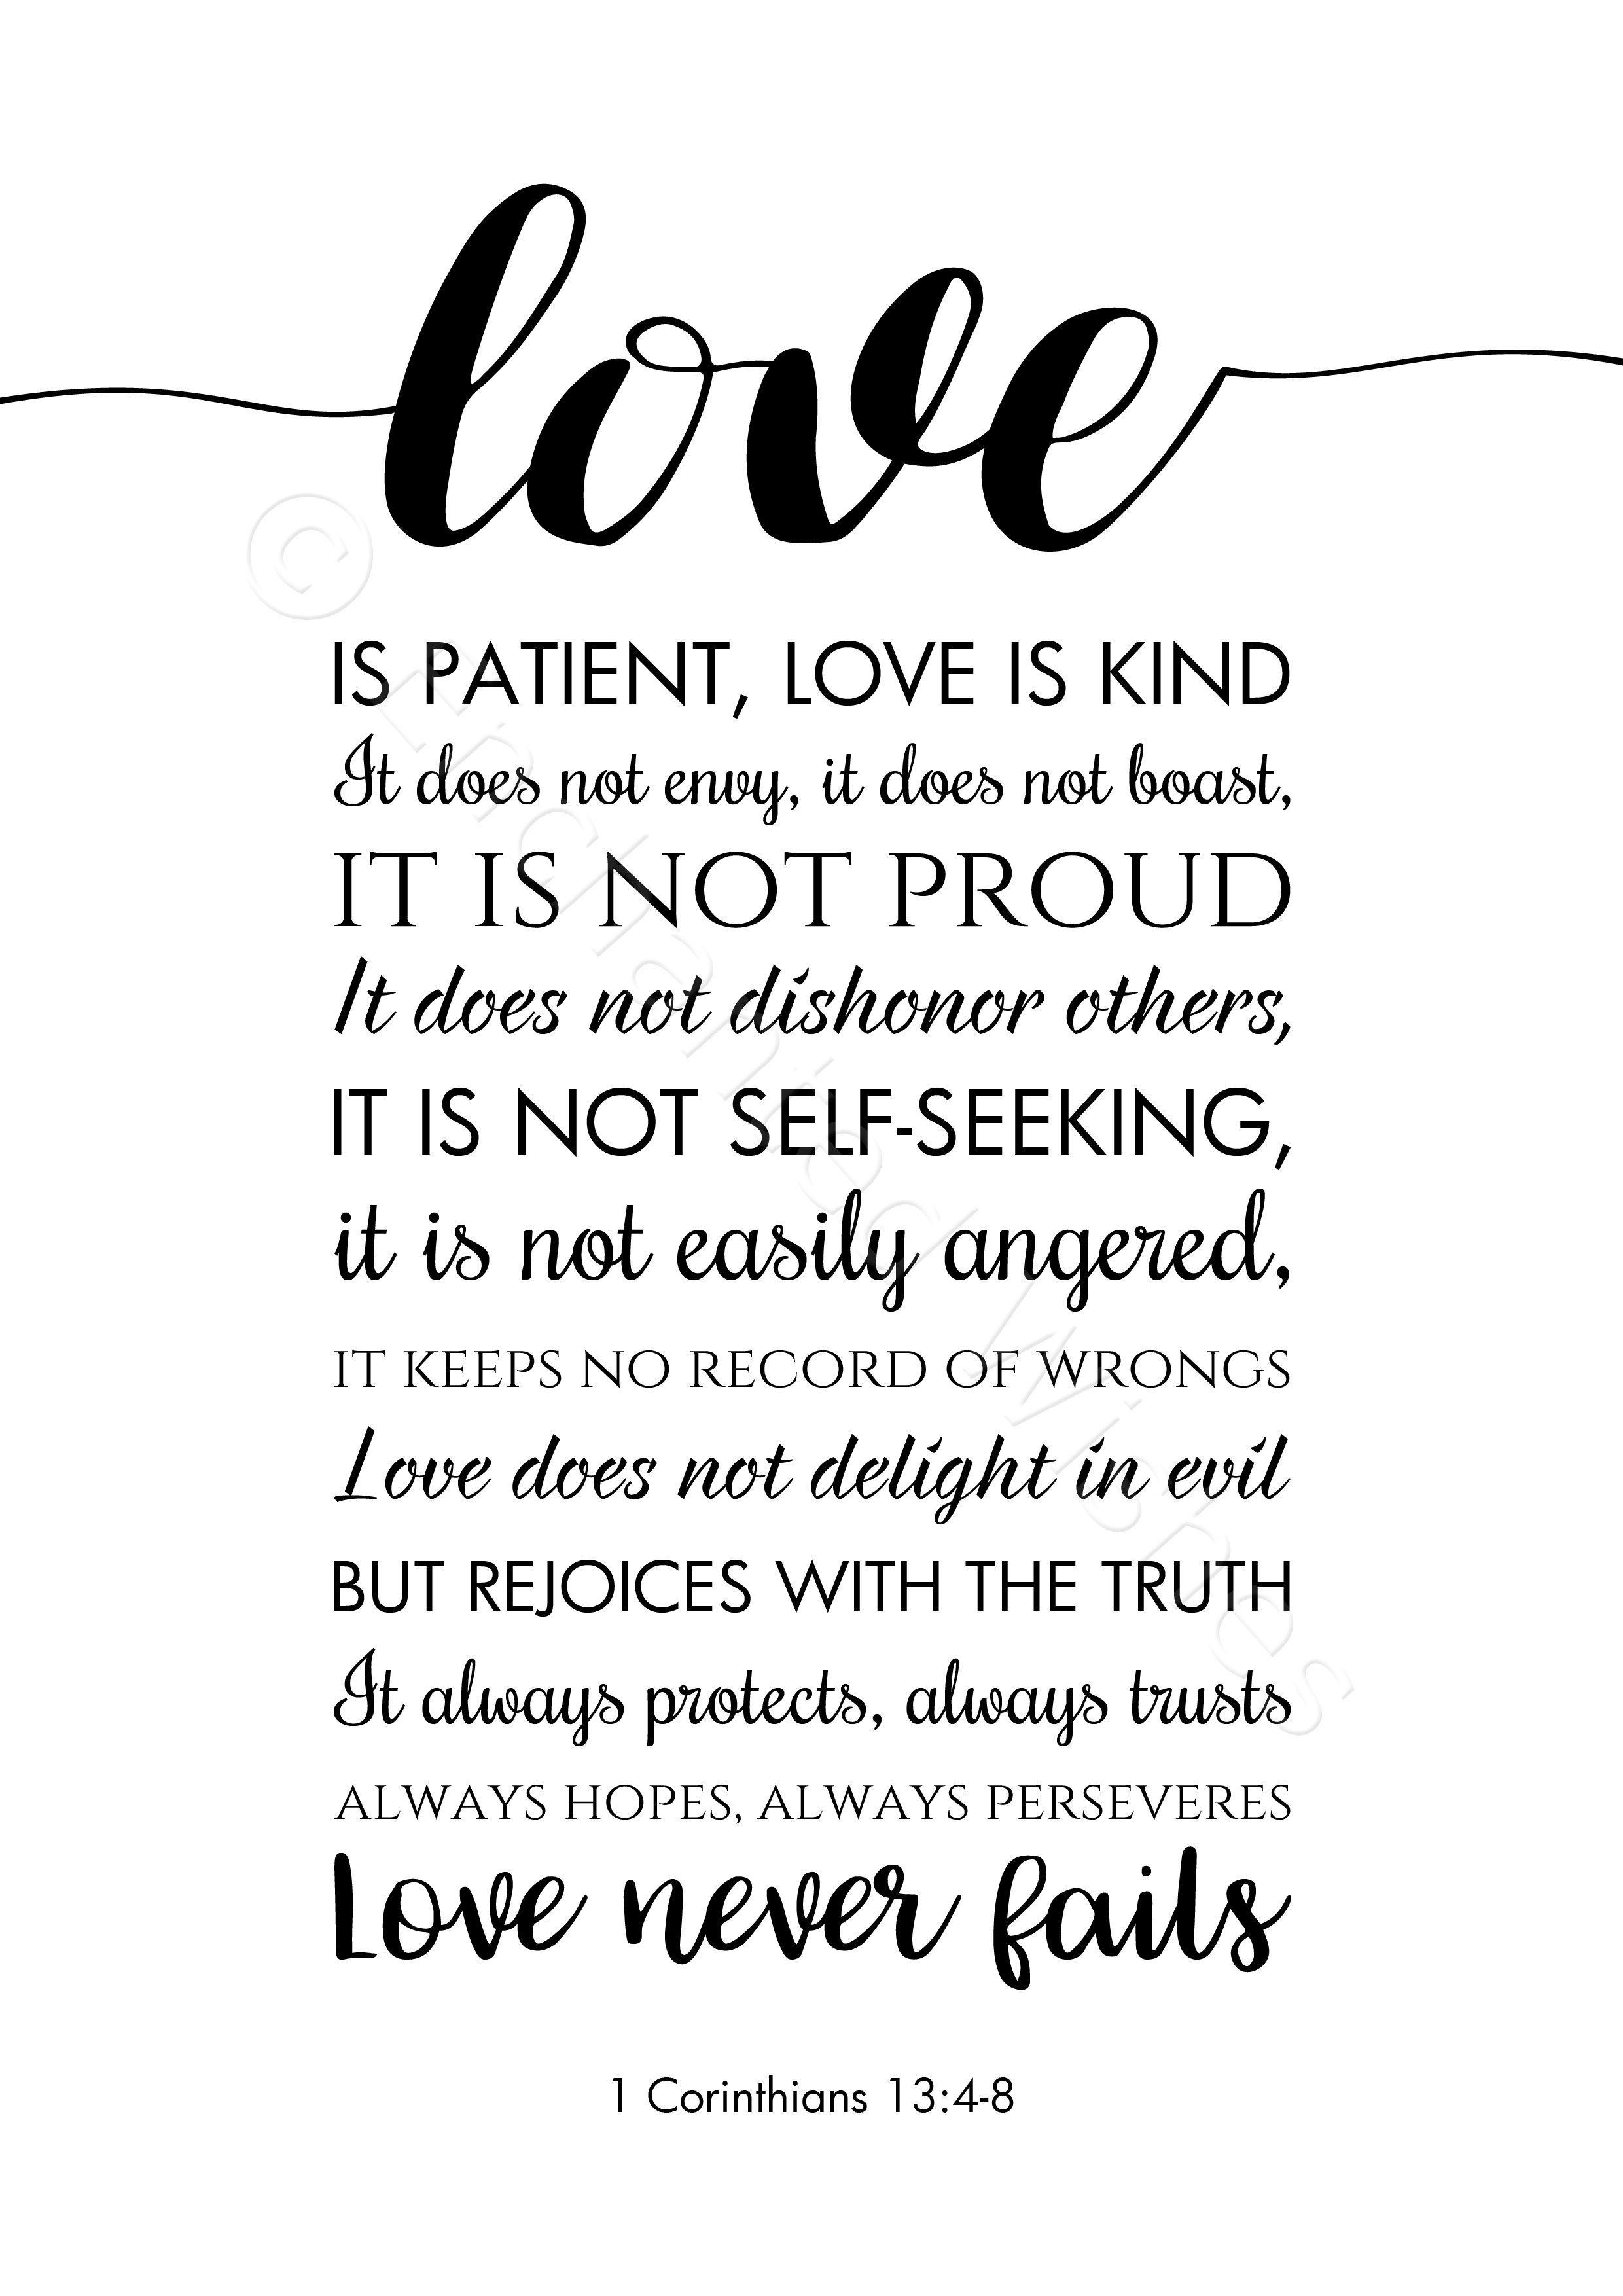 Love Is Kind Quote : quote, Quote, Patient, Retro, Future